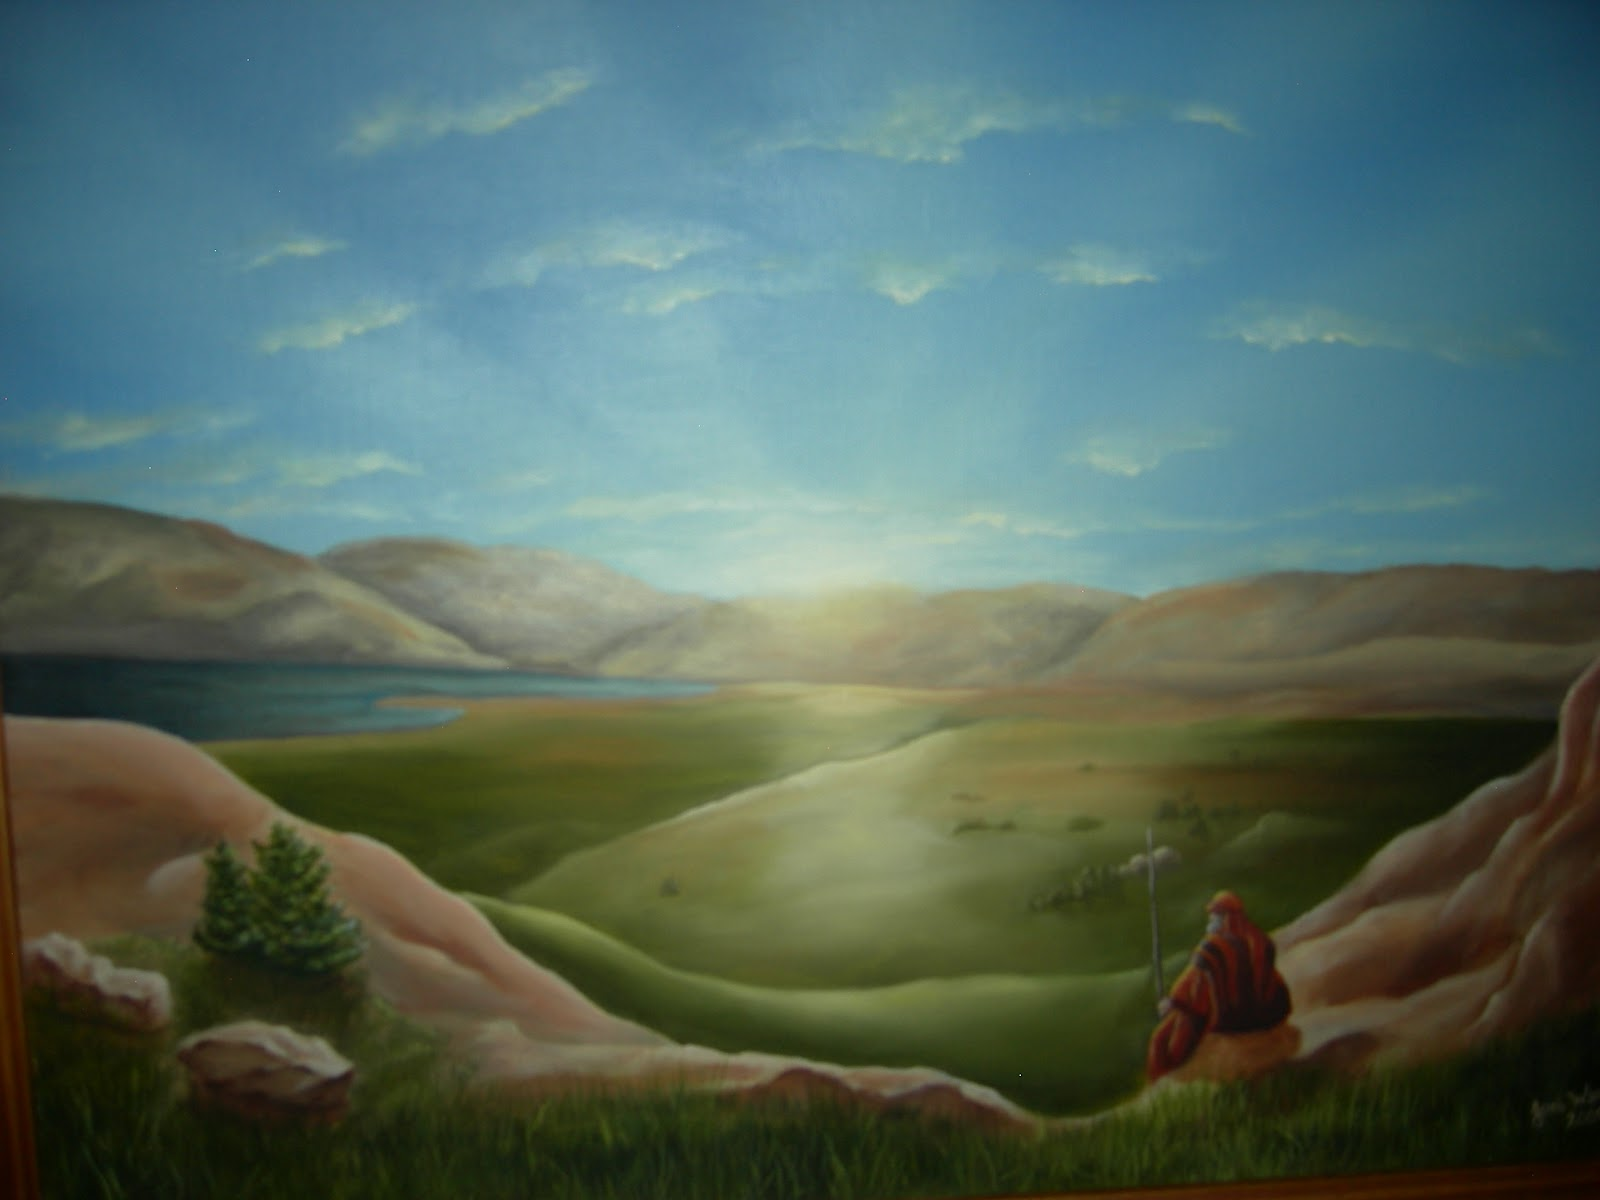 Taking the Promised Land – Ishshah's Story